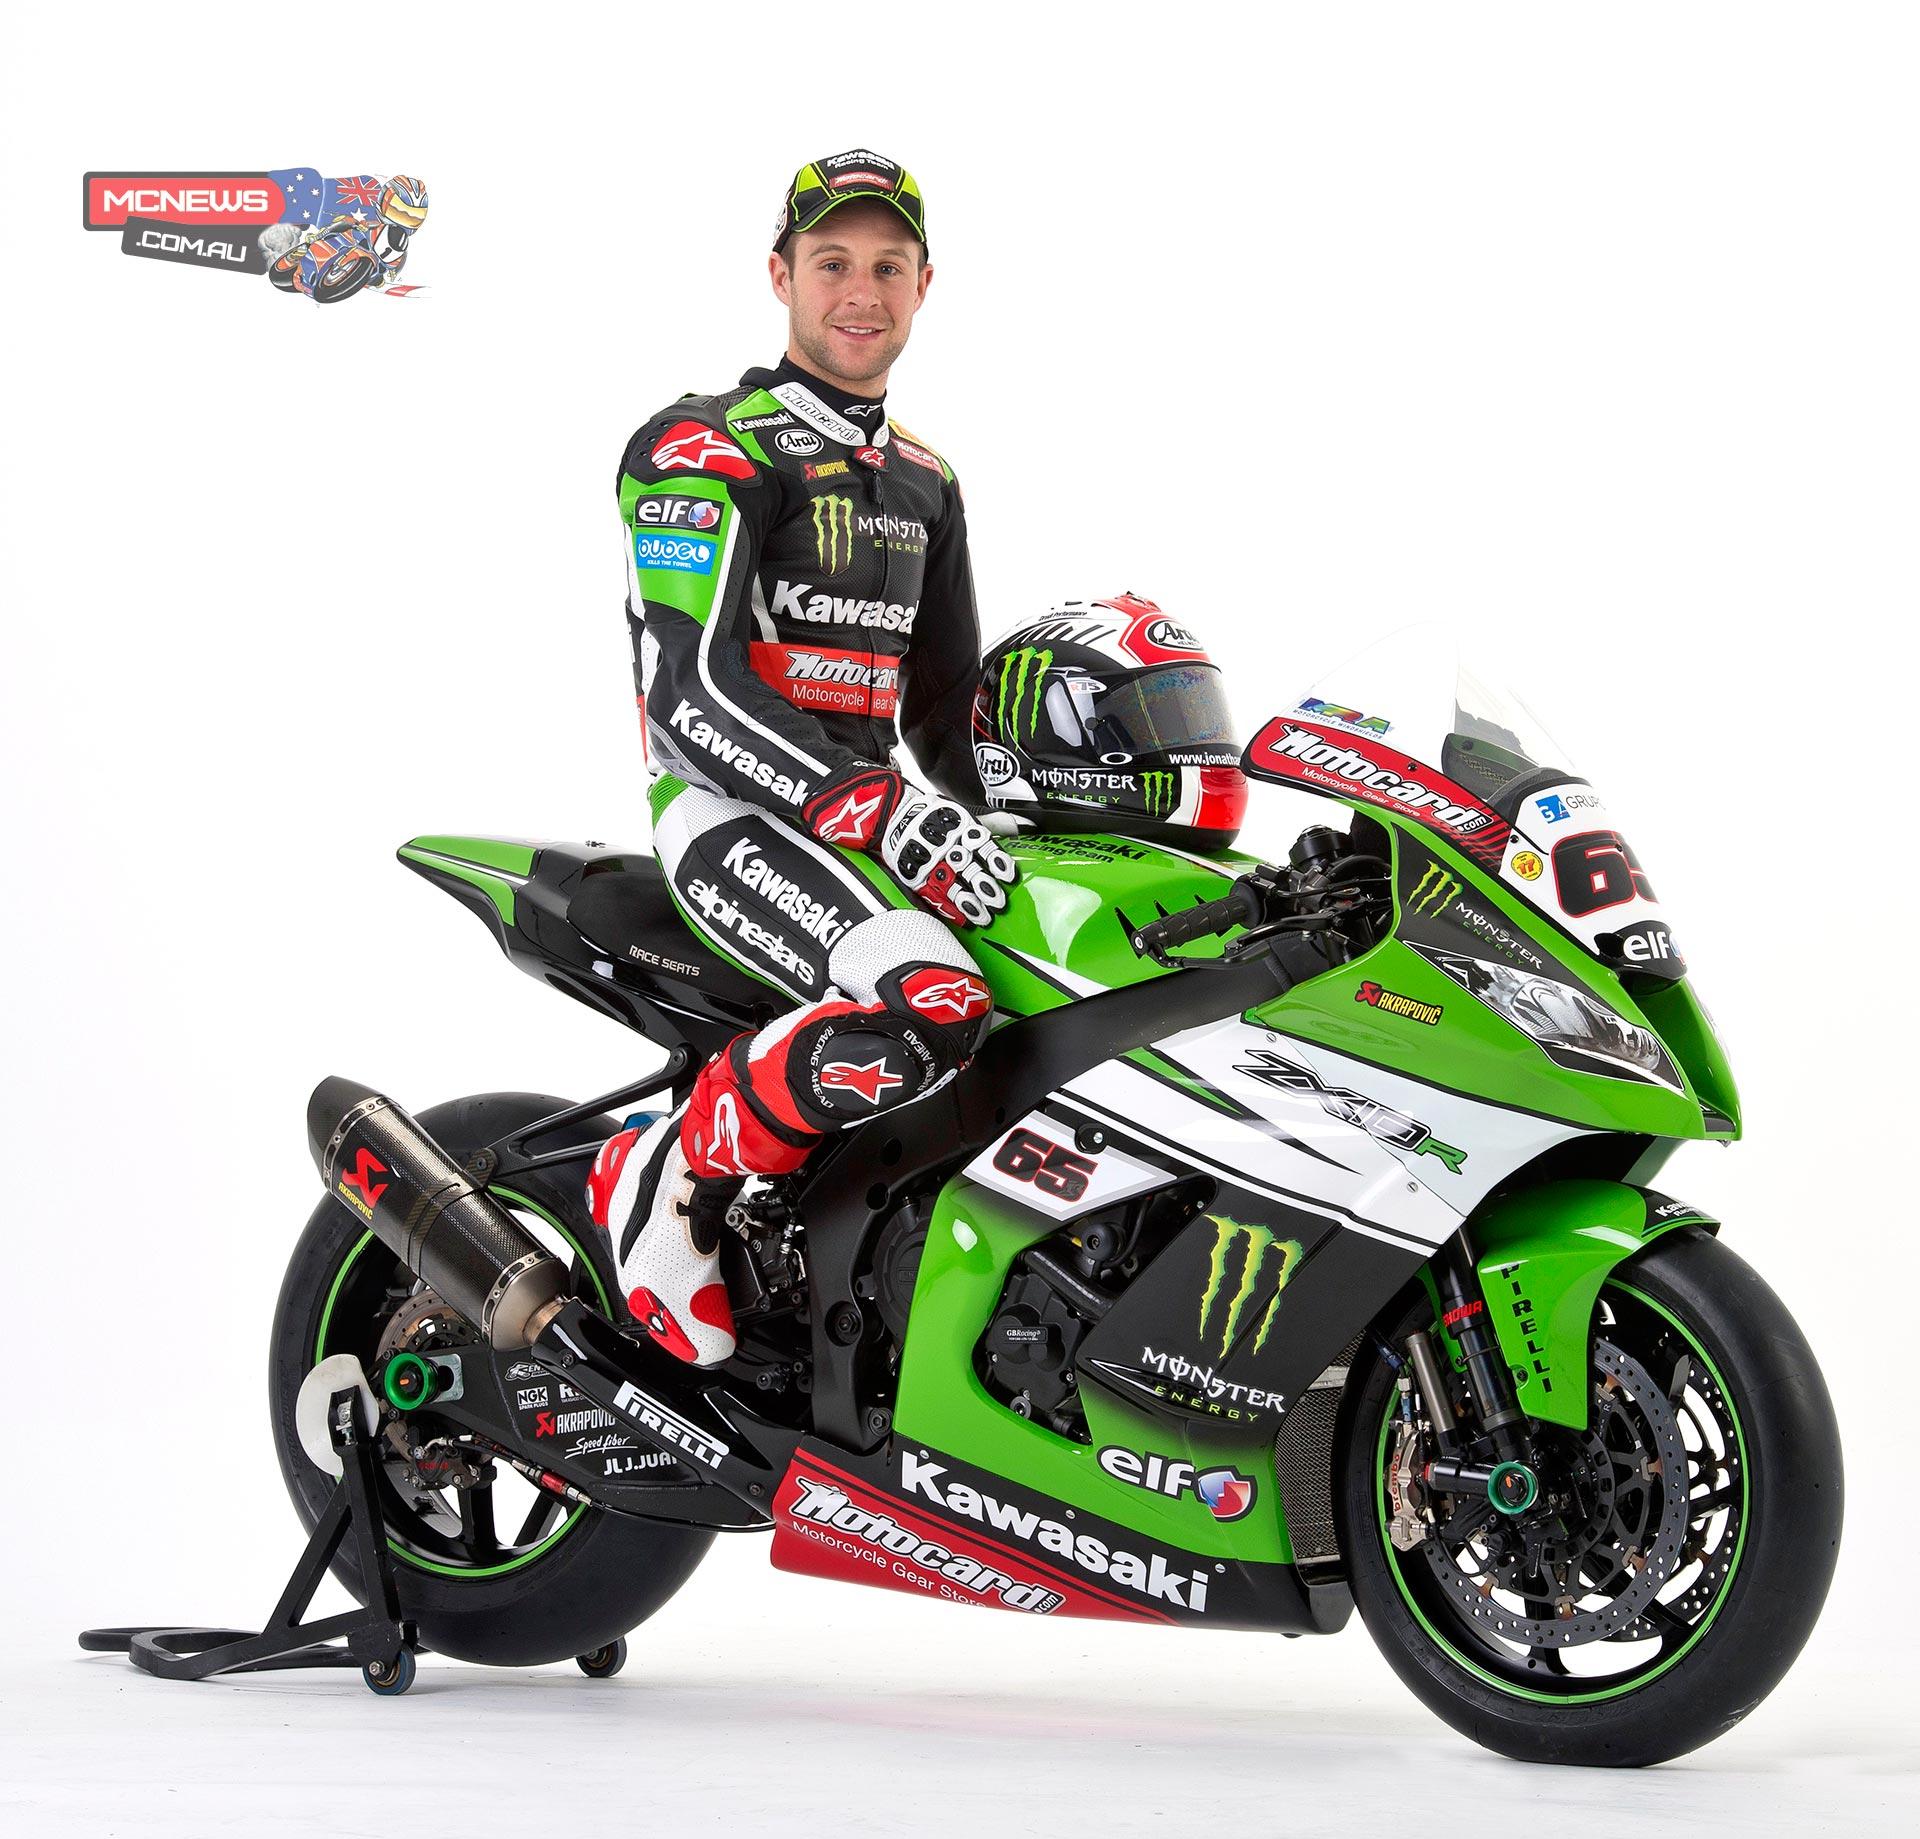 Kawasaki Racing Team WSBK Launch | MCNews.com.au